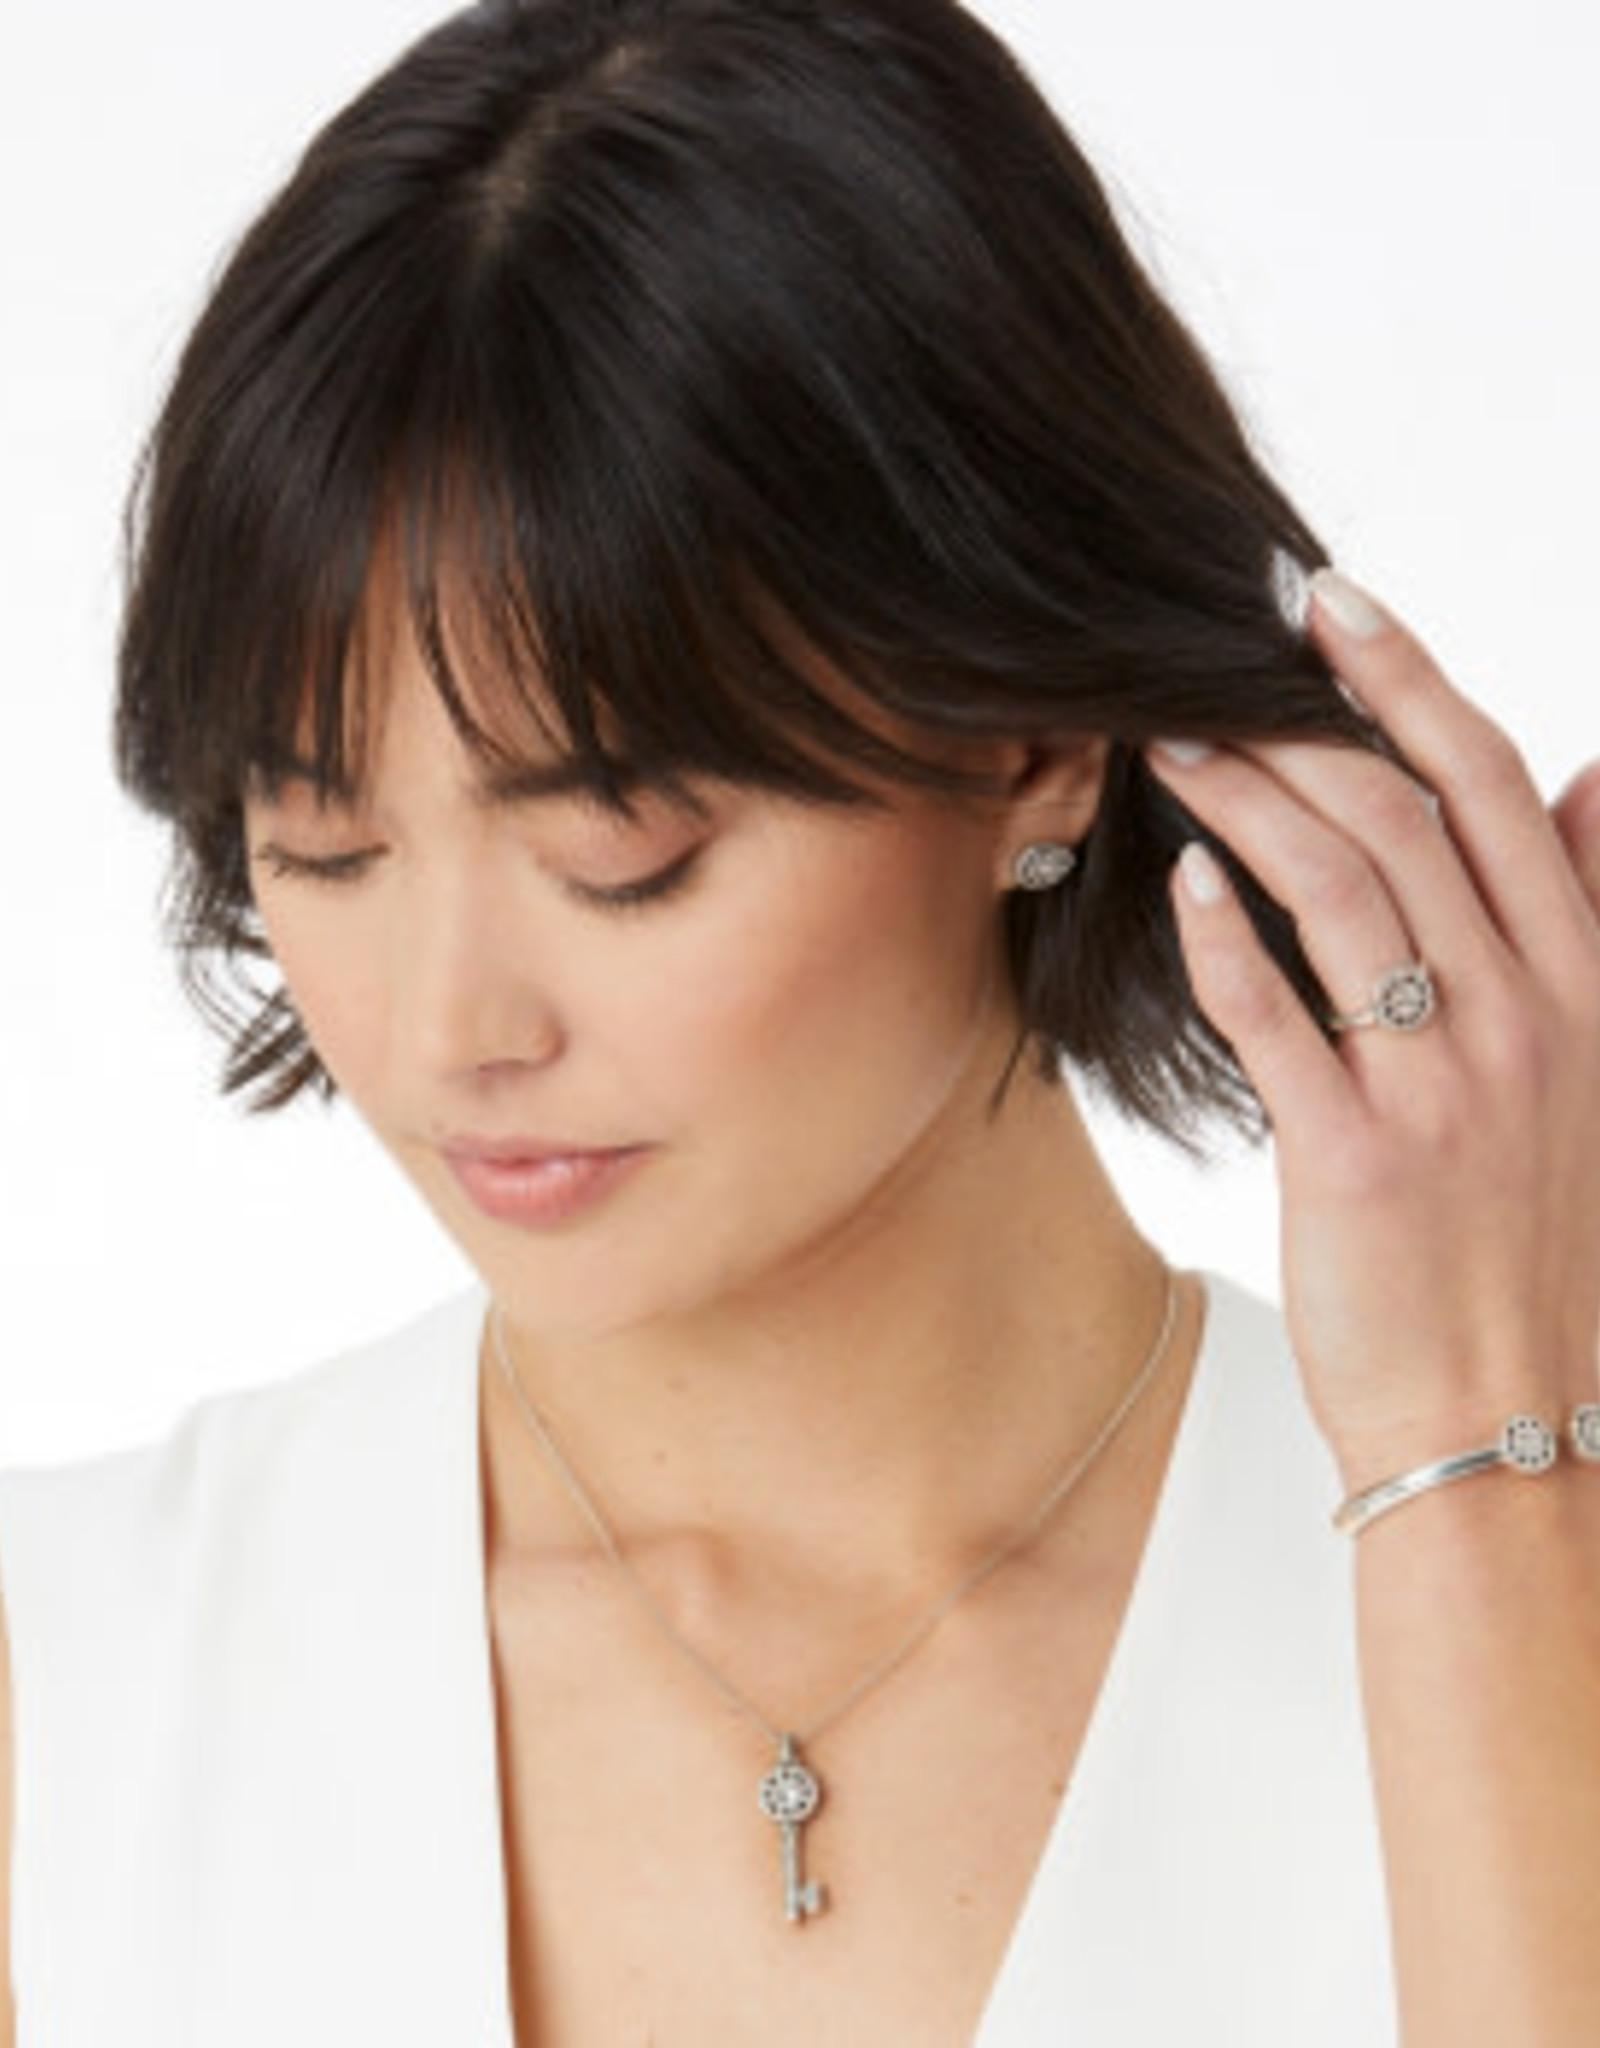 Brighton Brighton, Illumina Post Earrings